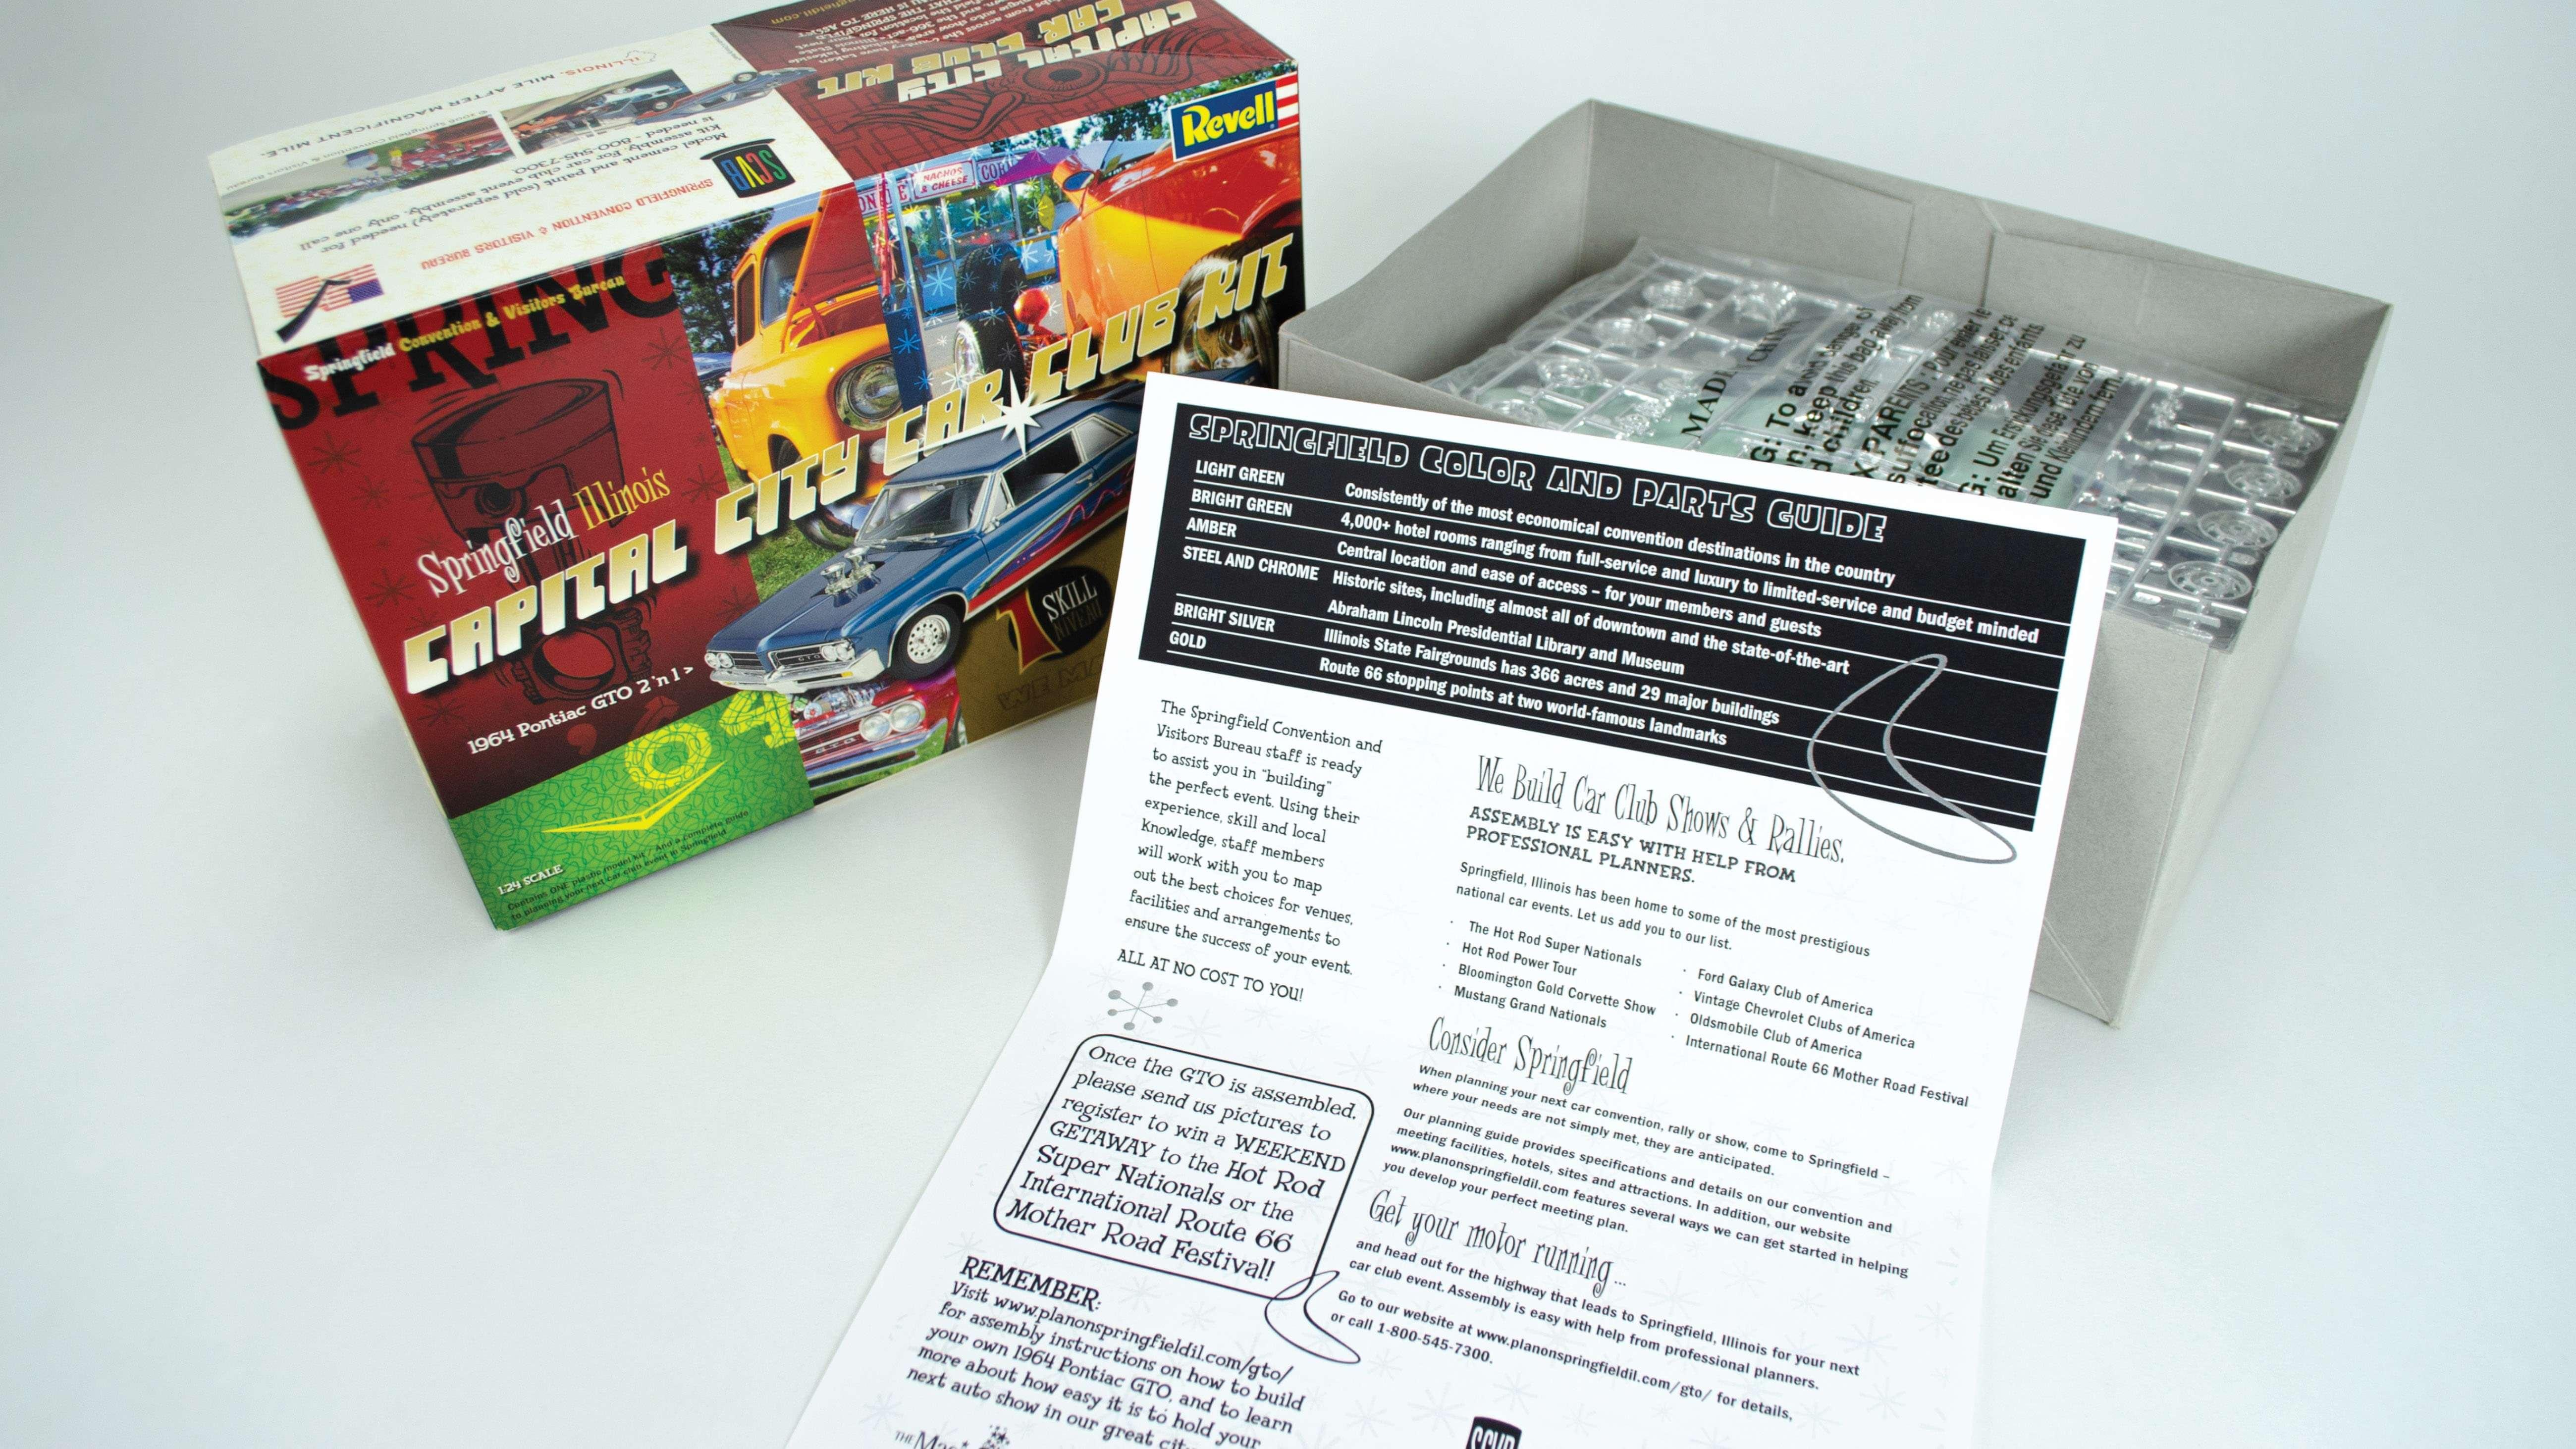 Springfield Convention & Visitors Bureau | Capital City Car Club Kit